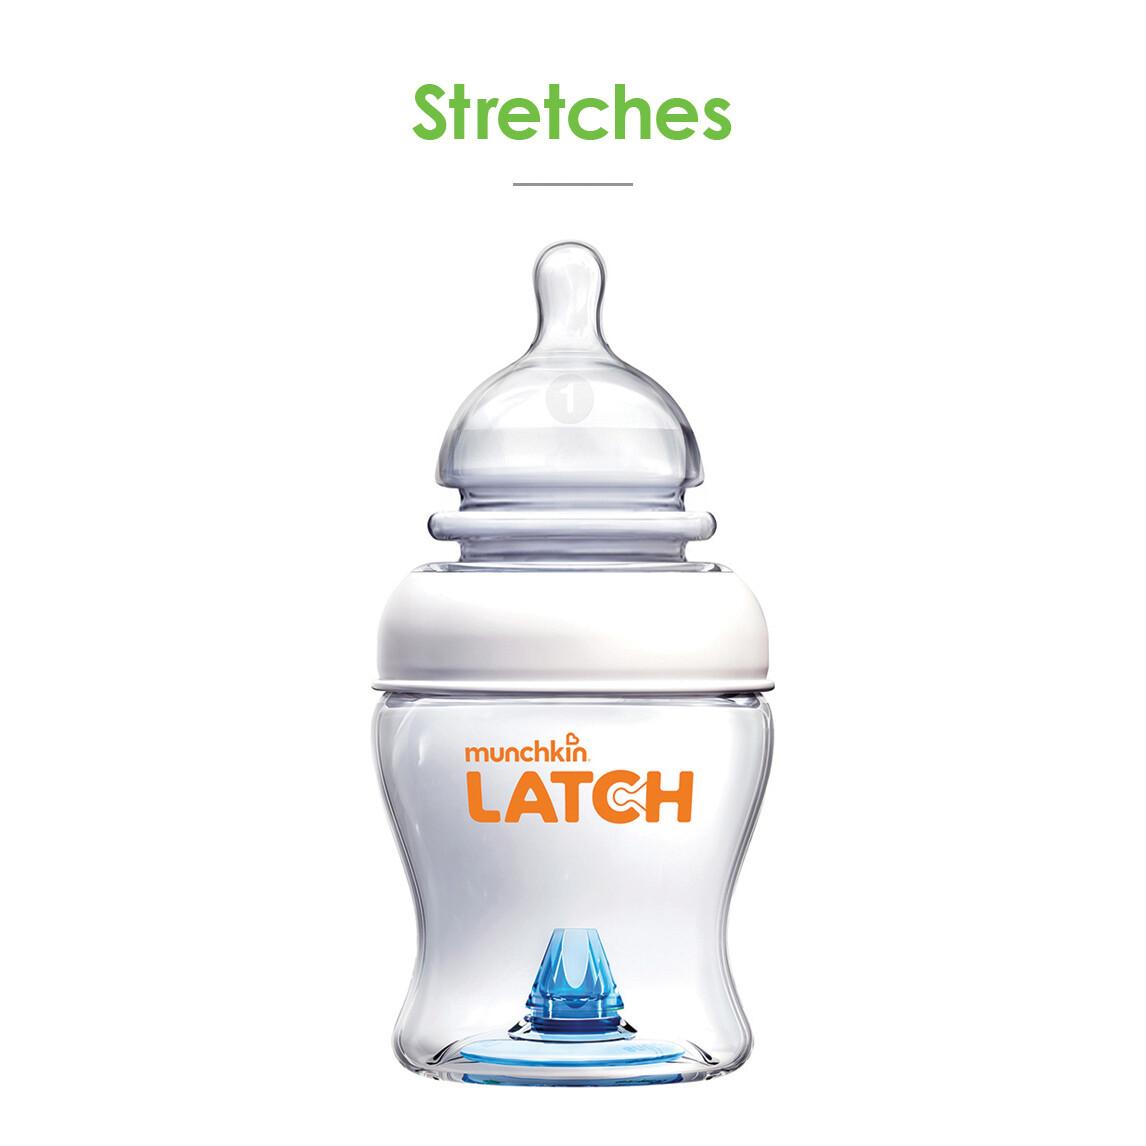 MUNCHKIN LATCH 240 ml Bottle (1 Pack)